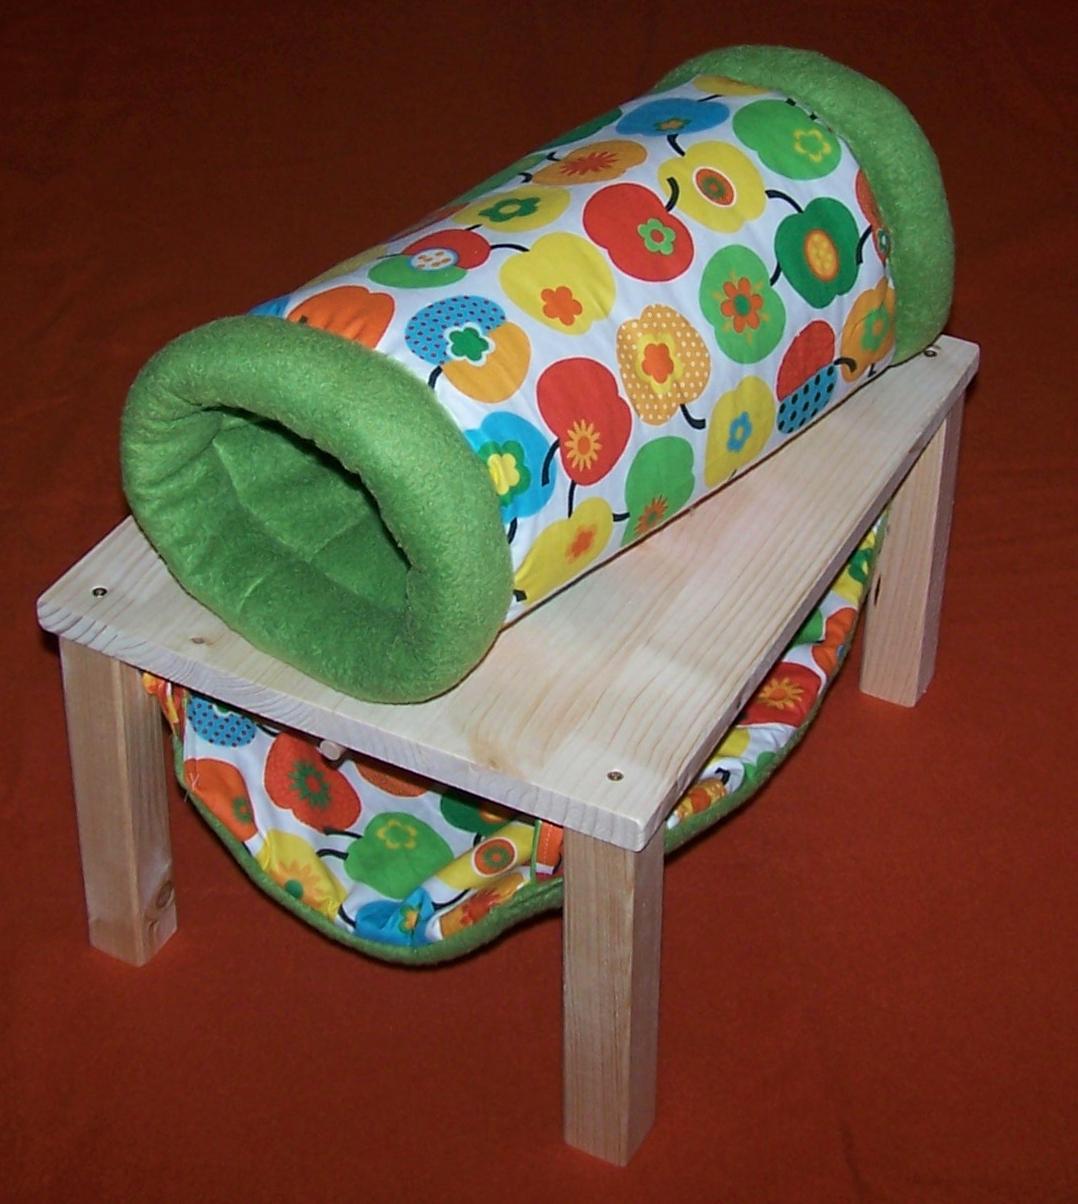 lazzyys kuschelshop lazzyy de luxe h ngematte kuschelrolle gro e auswahl lazzyys kuschelshop. Black Bedroom Furniture Sets. Home Design Ideas